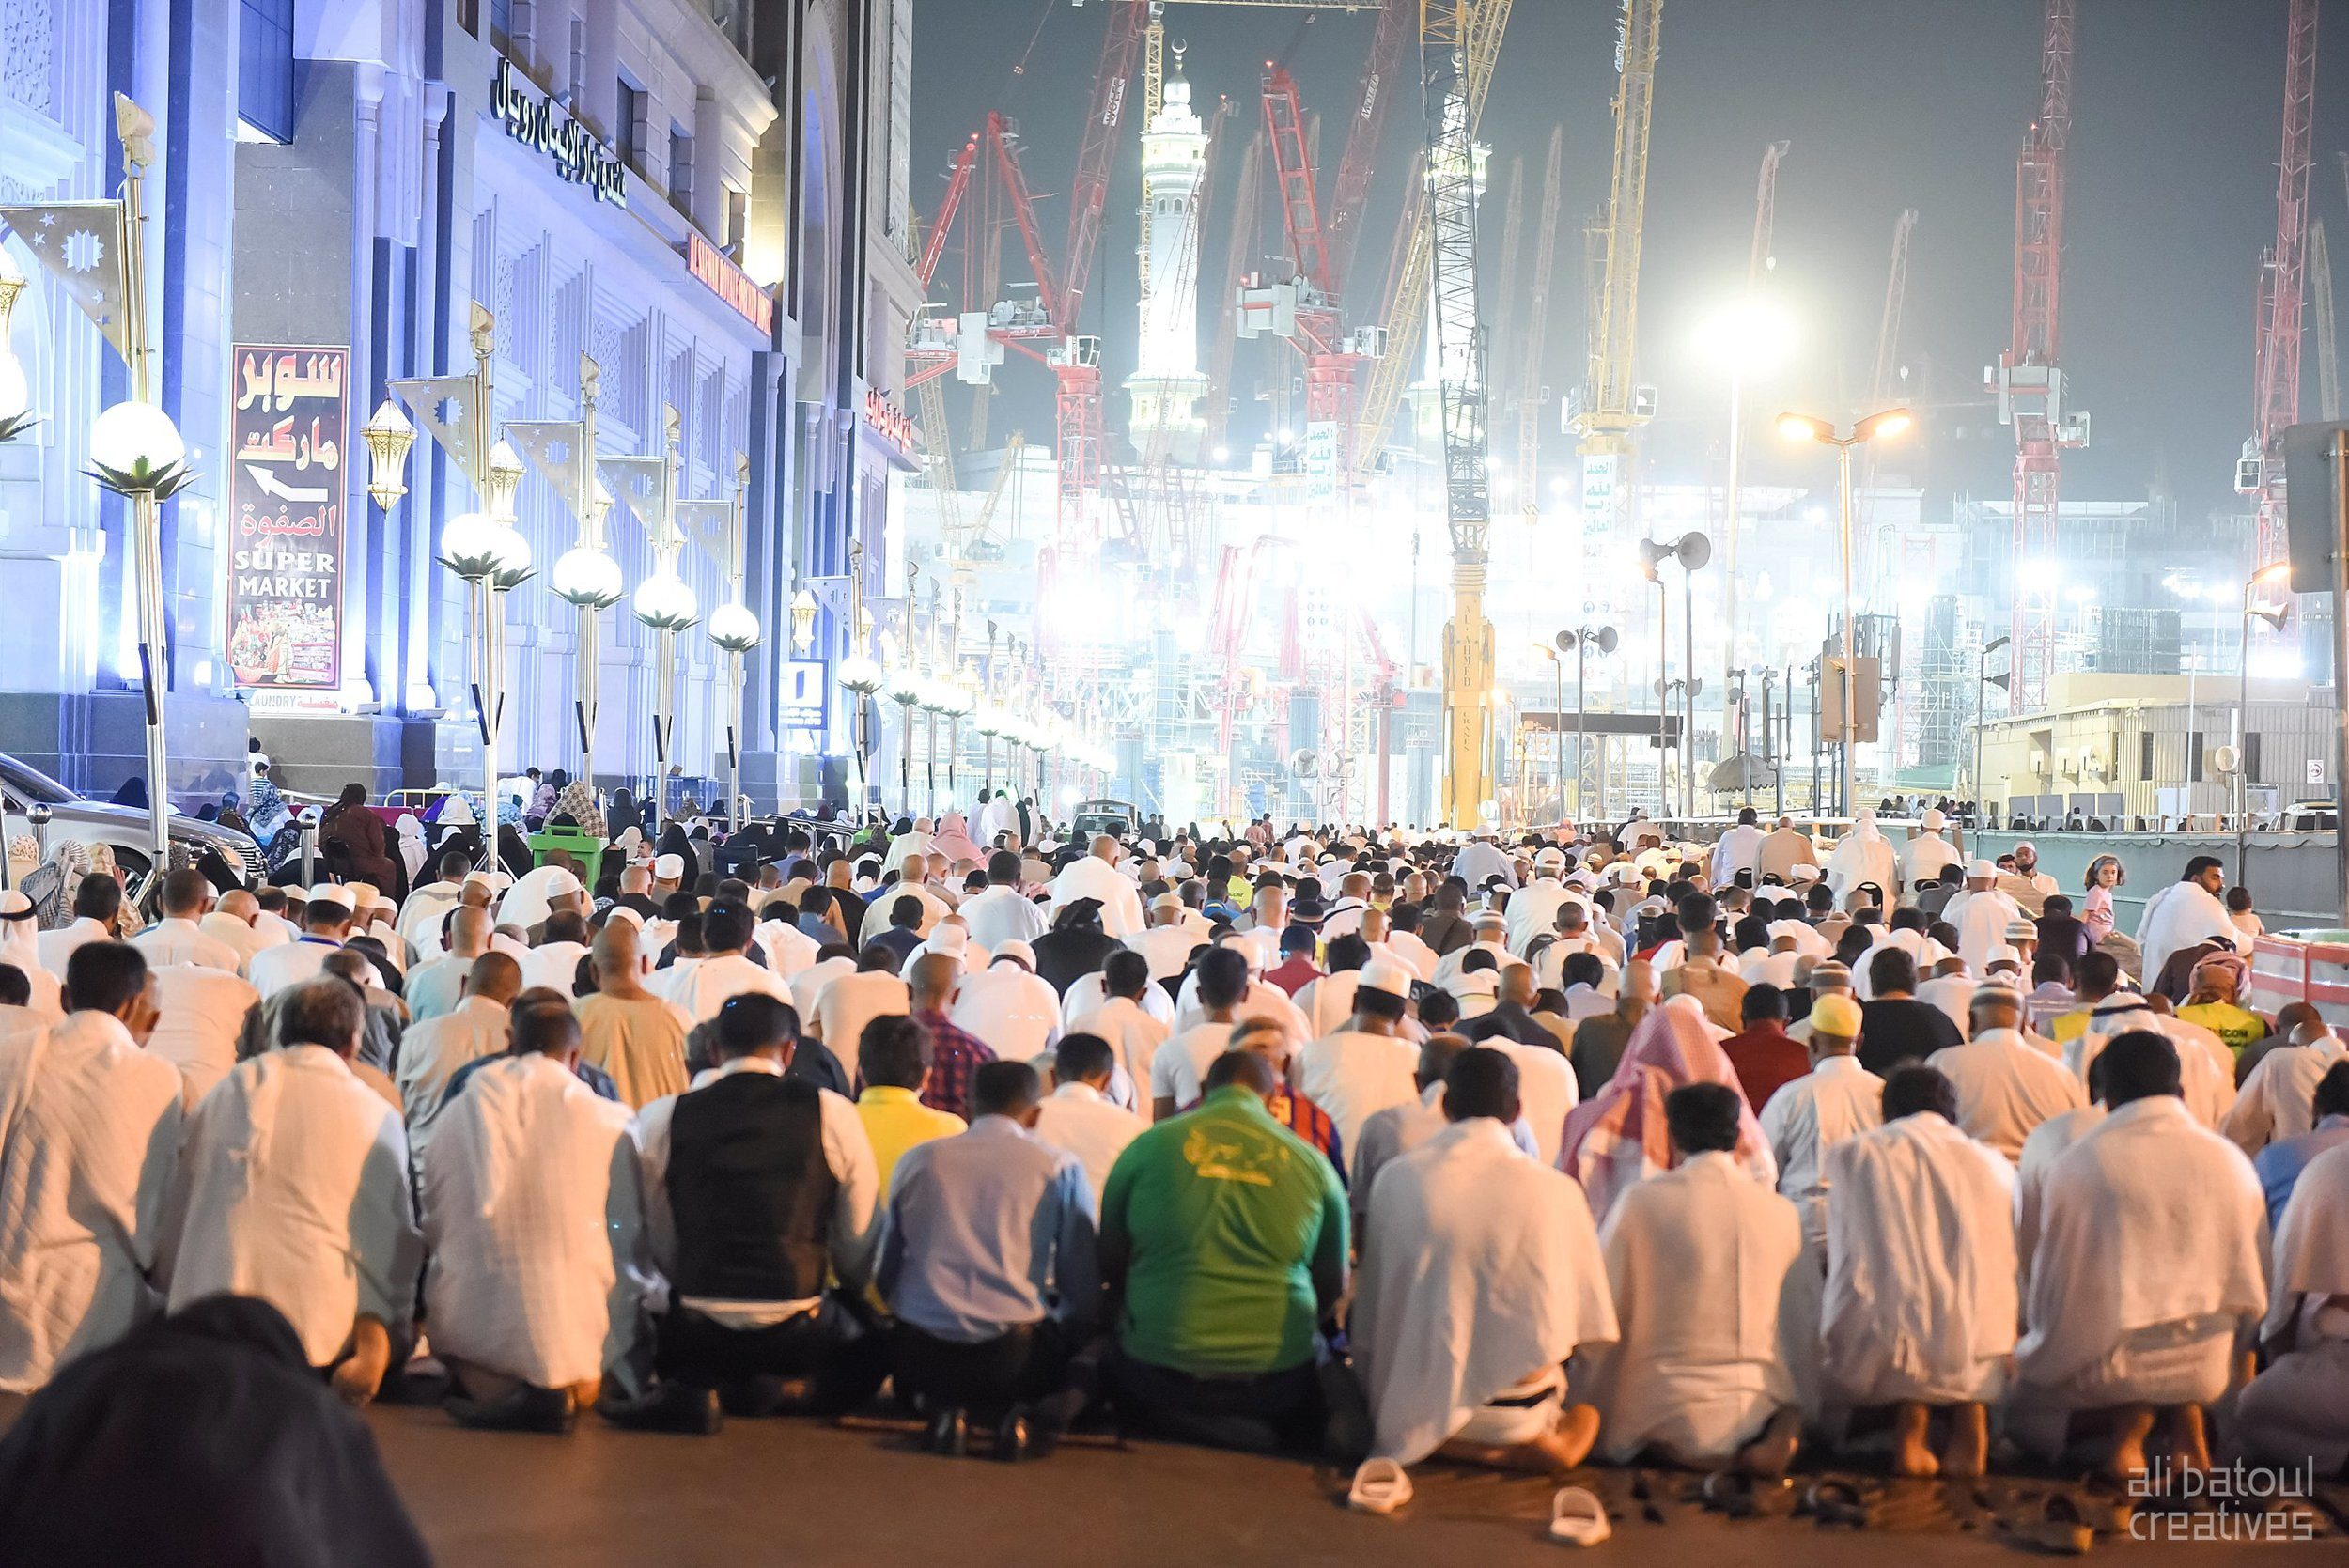 Umrah 2015 (Mecca) - Ali Batoul Creatives-2_Stomped.jpg